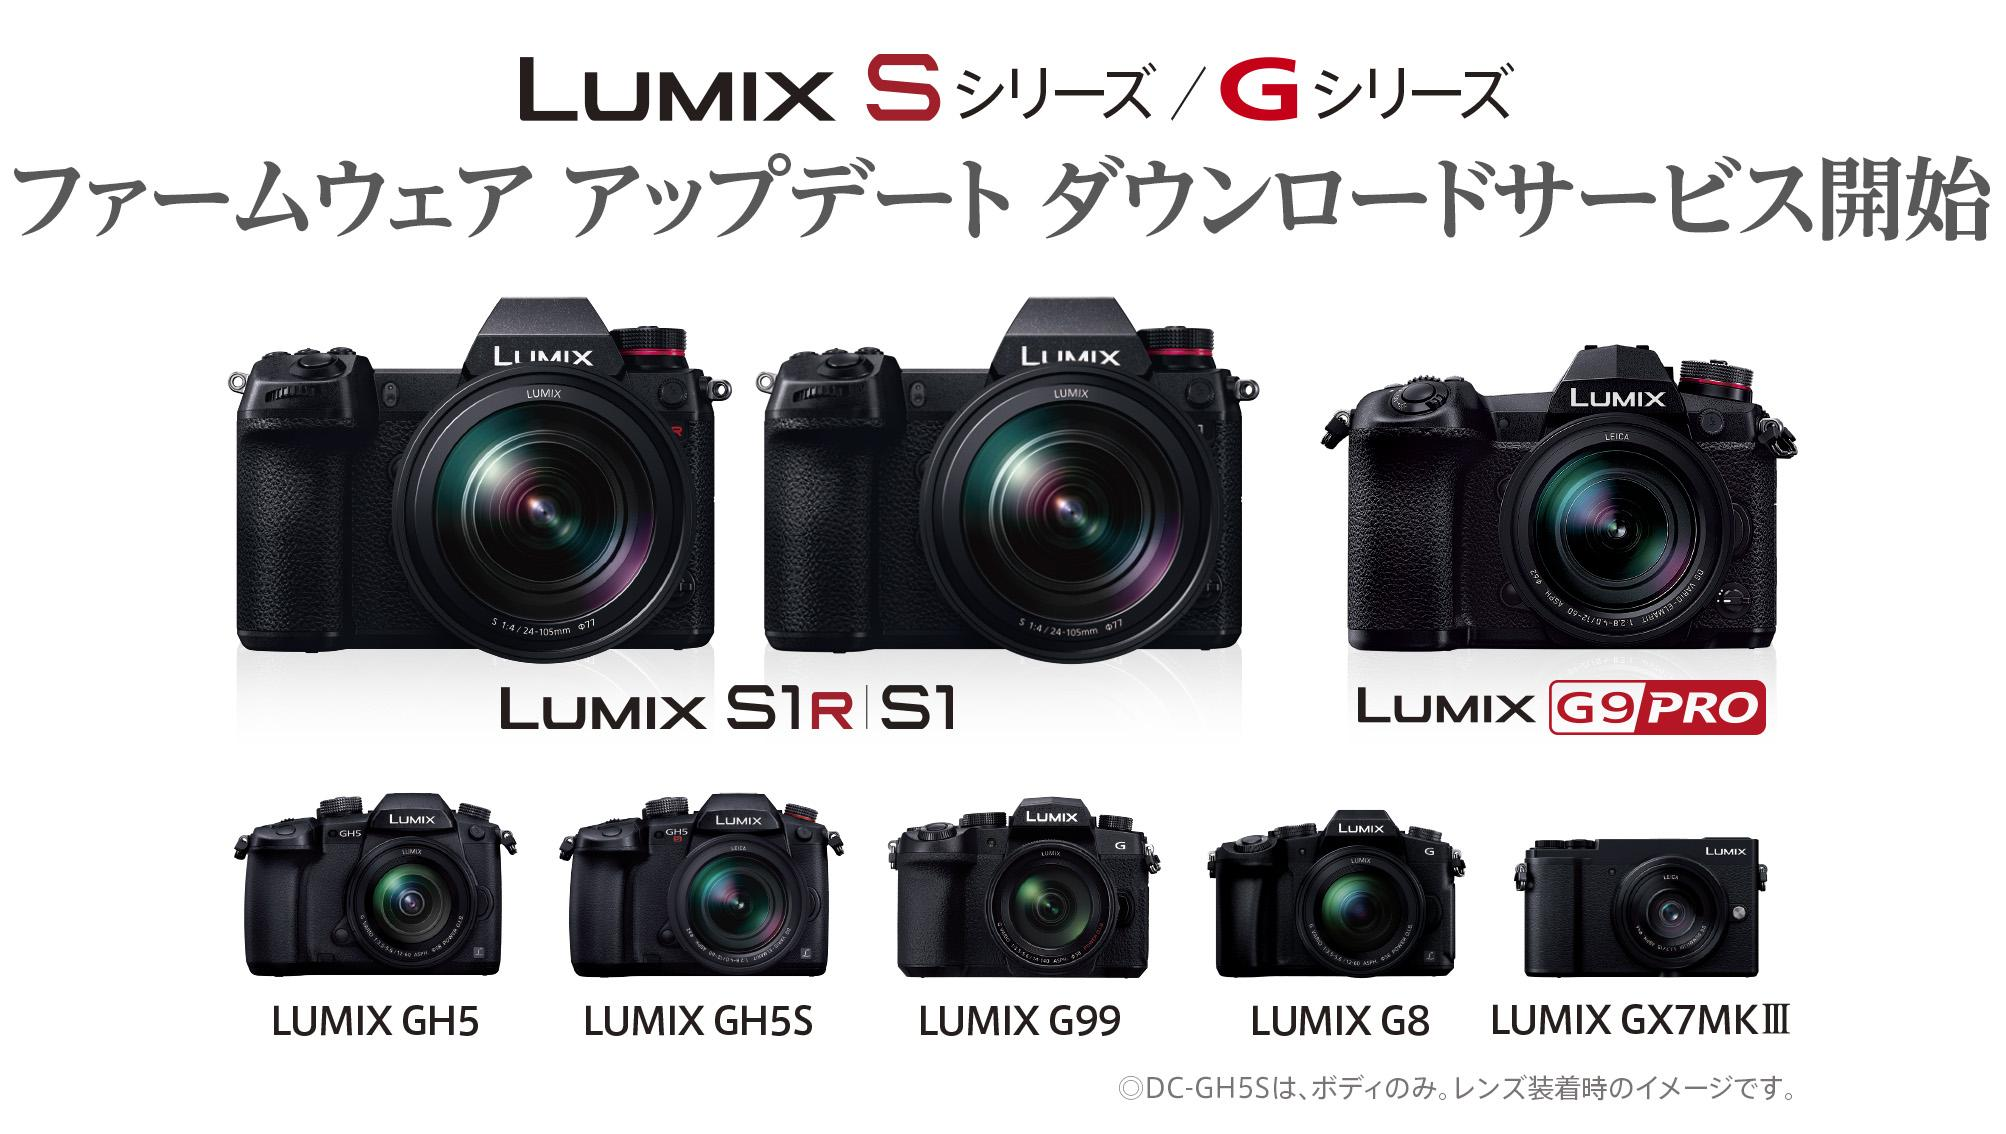 LUMIX Sシリーズ / Gシリーズ ファームウェア アップデート ダウンロードサービス開始